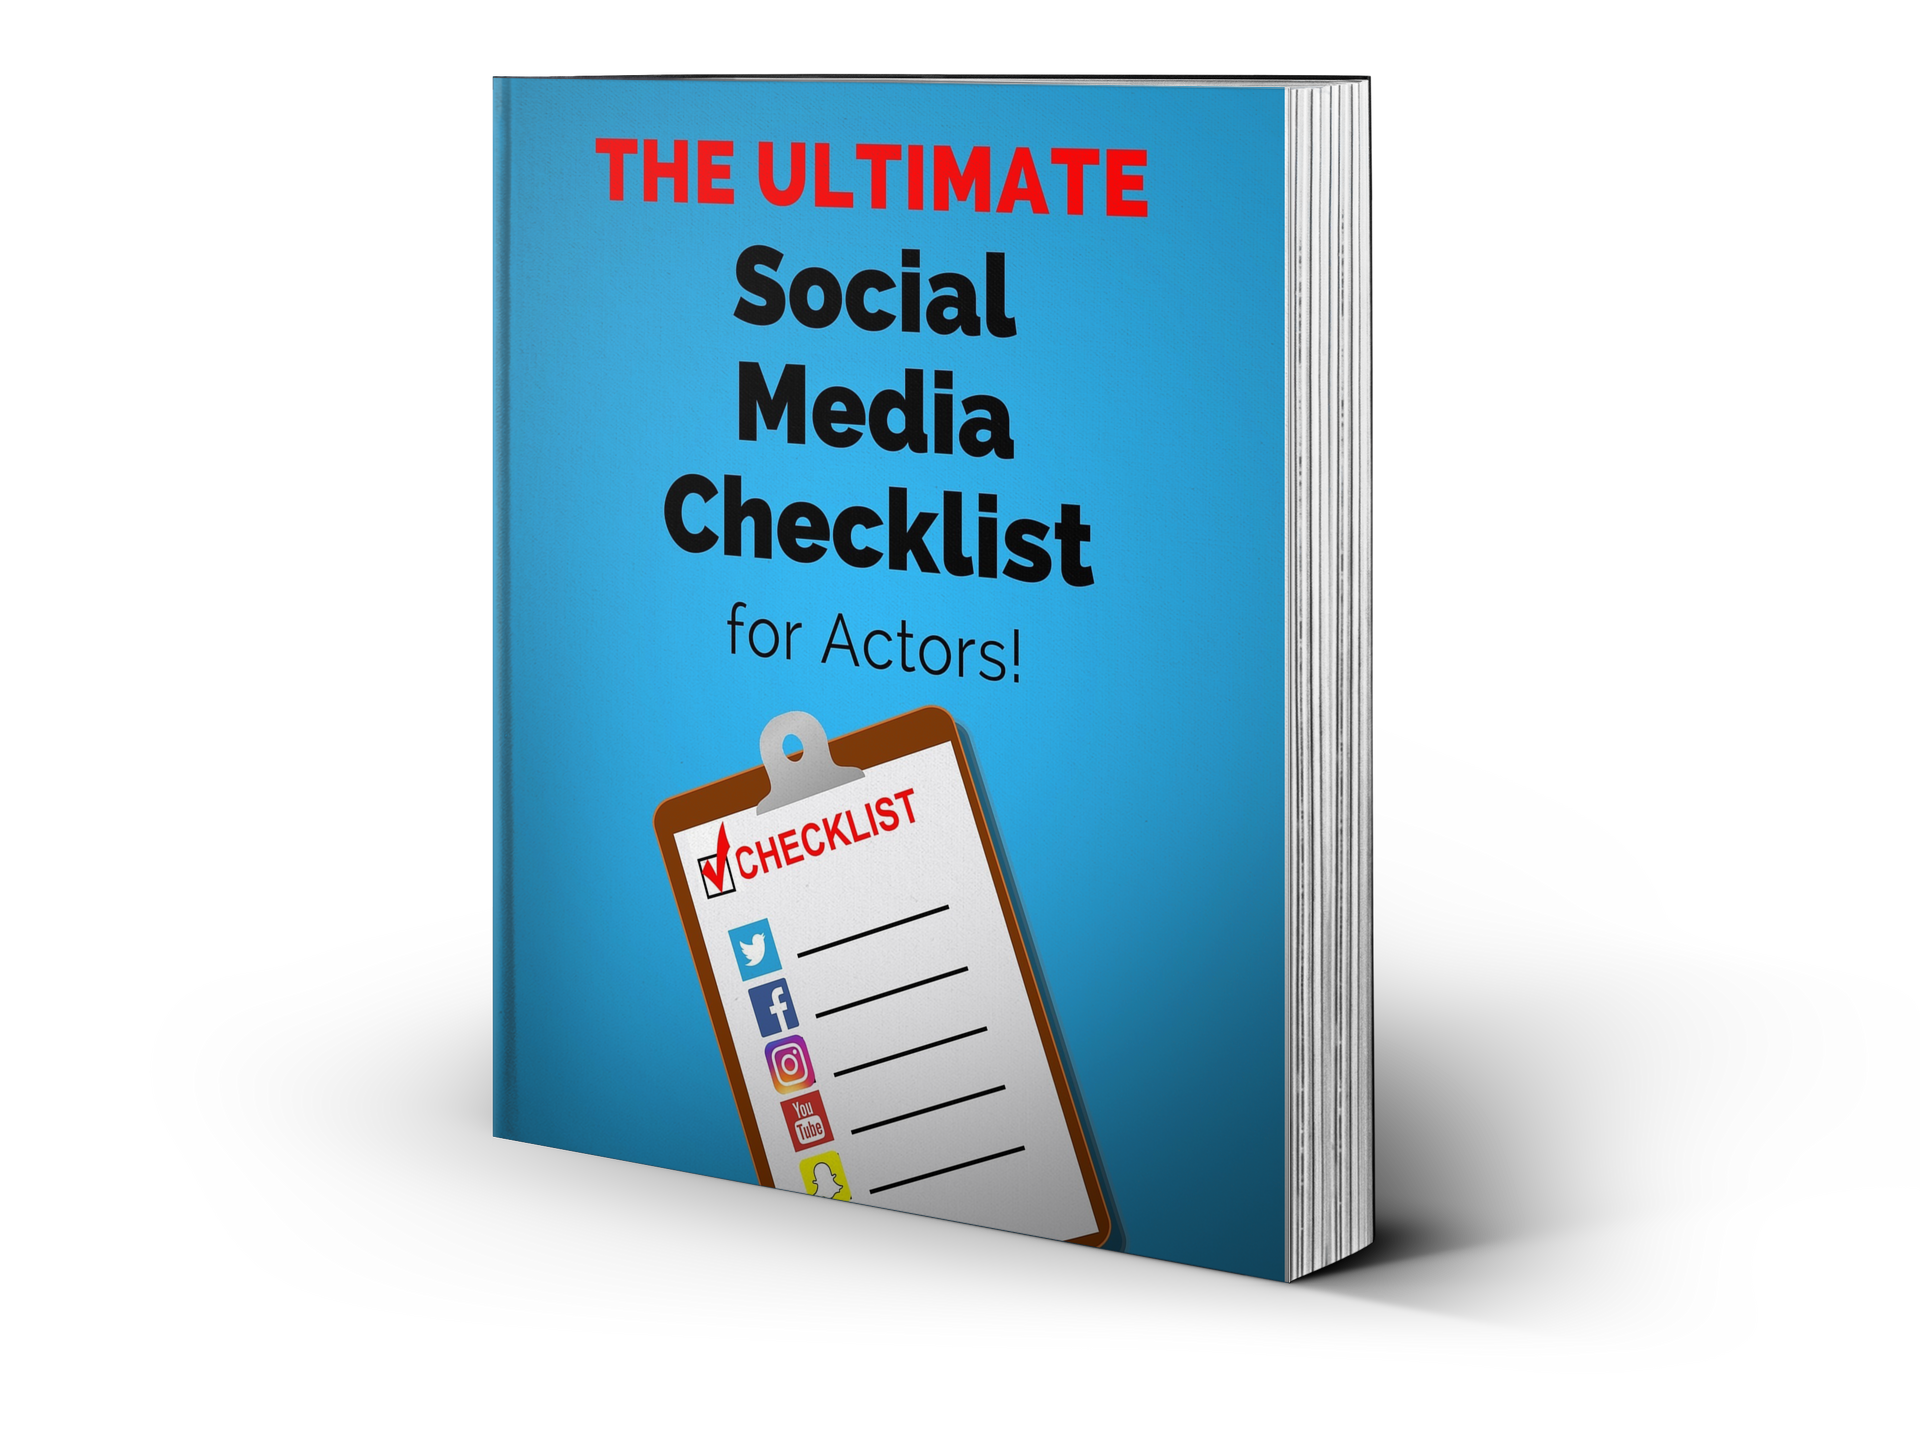 Ultimate Checklist Social Media for Actors